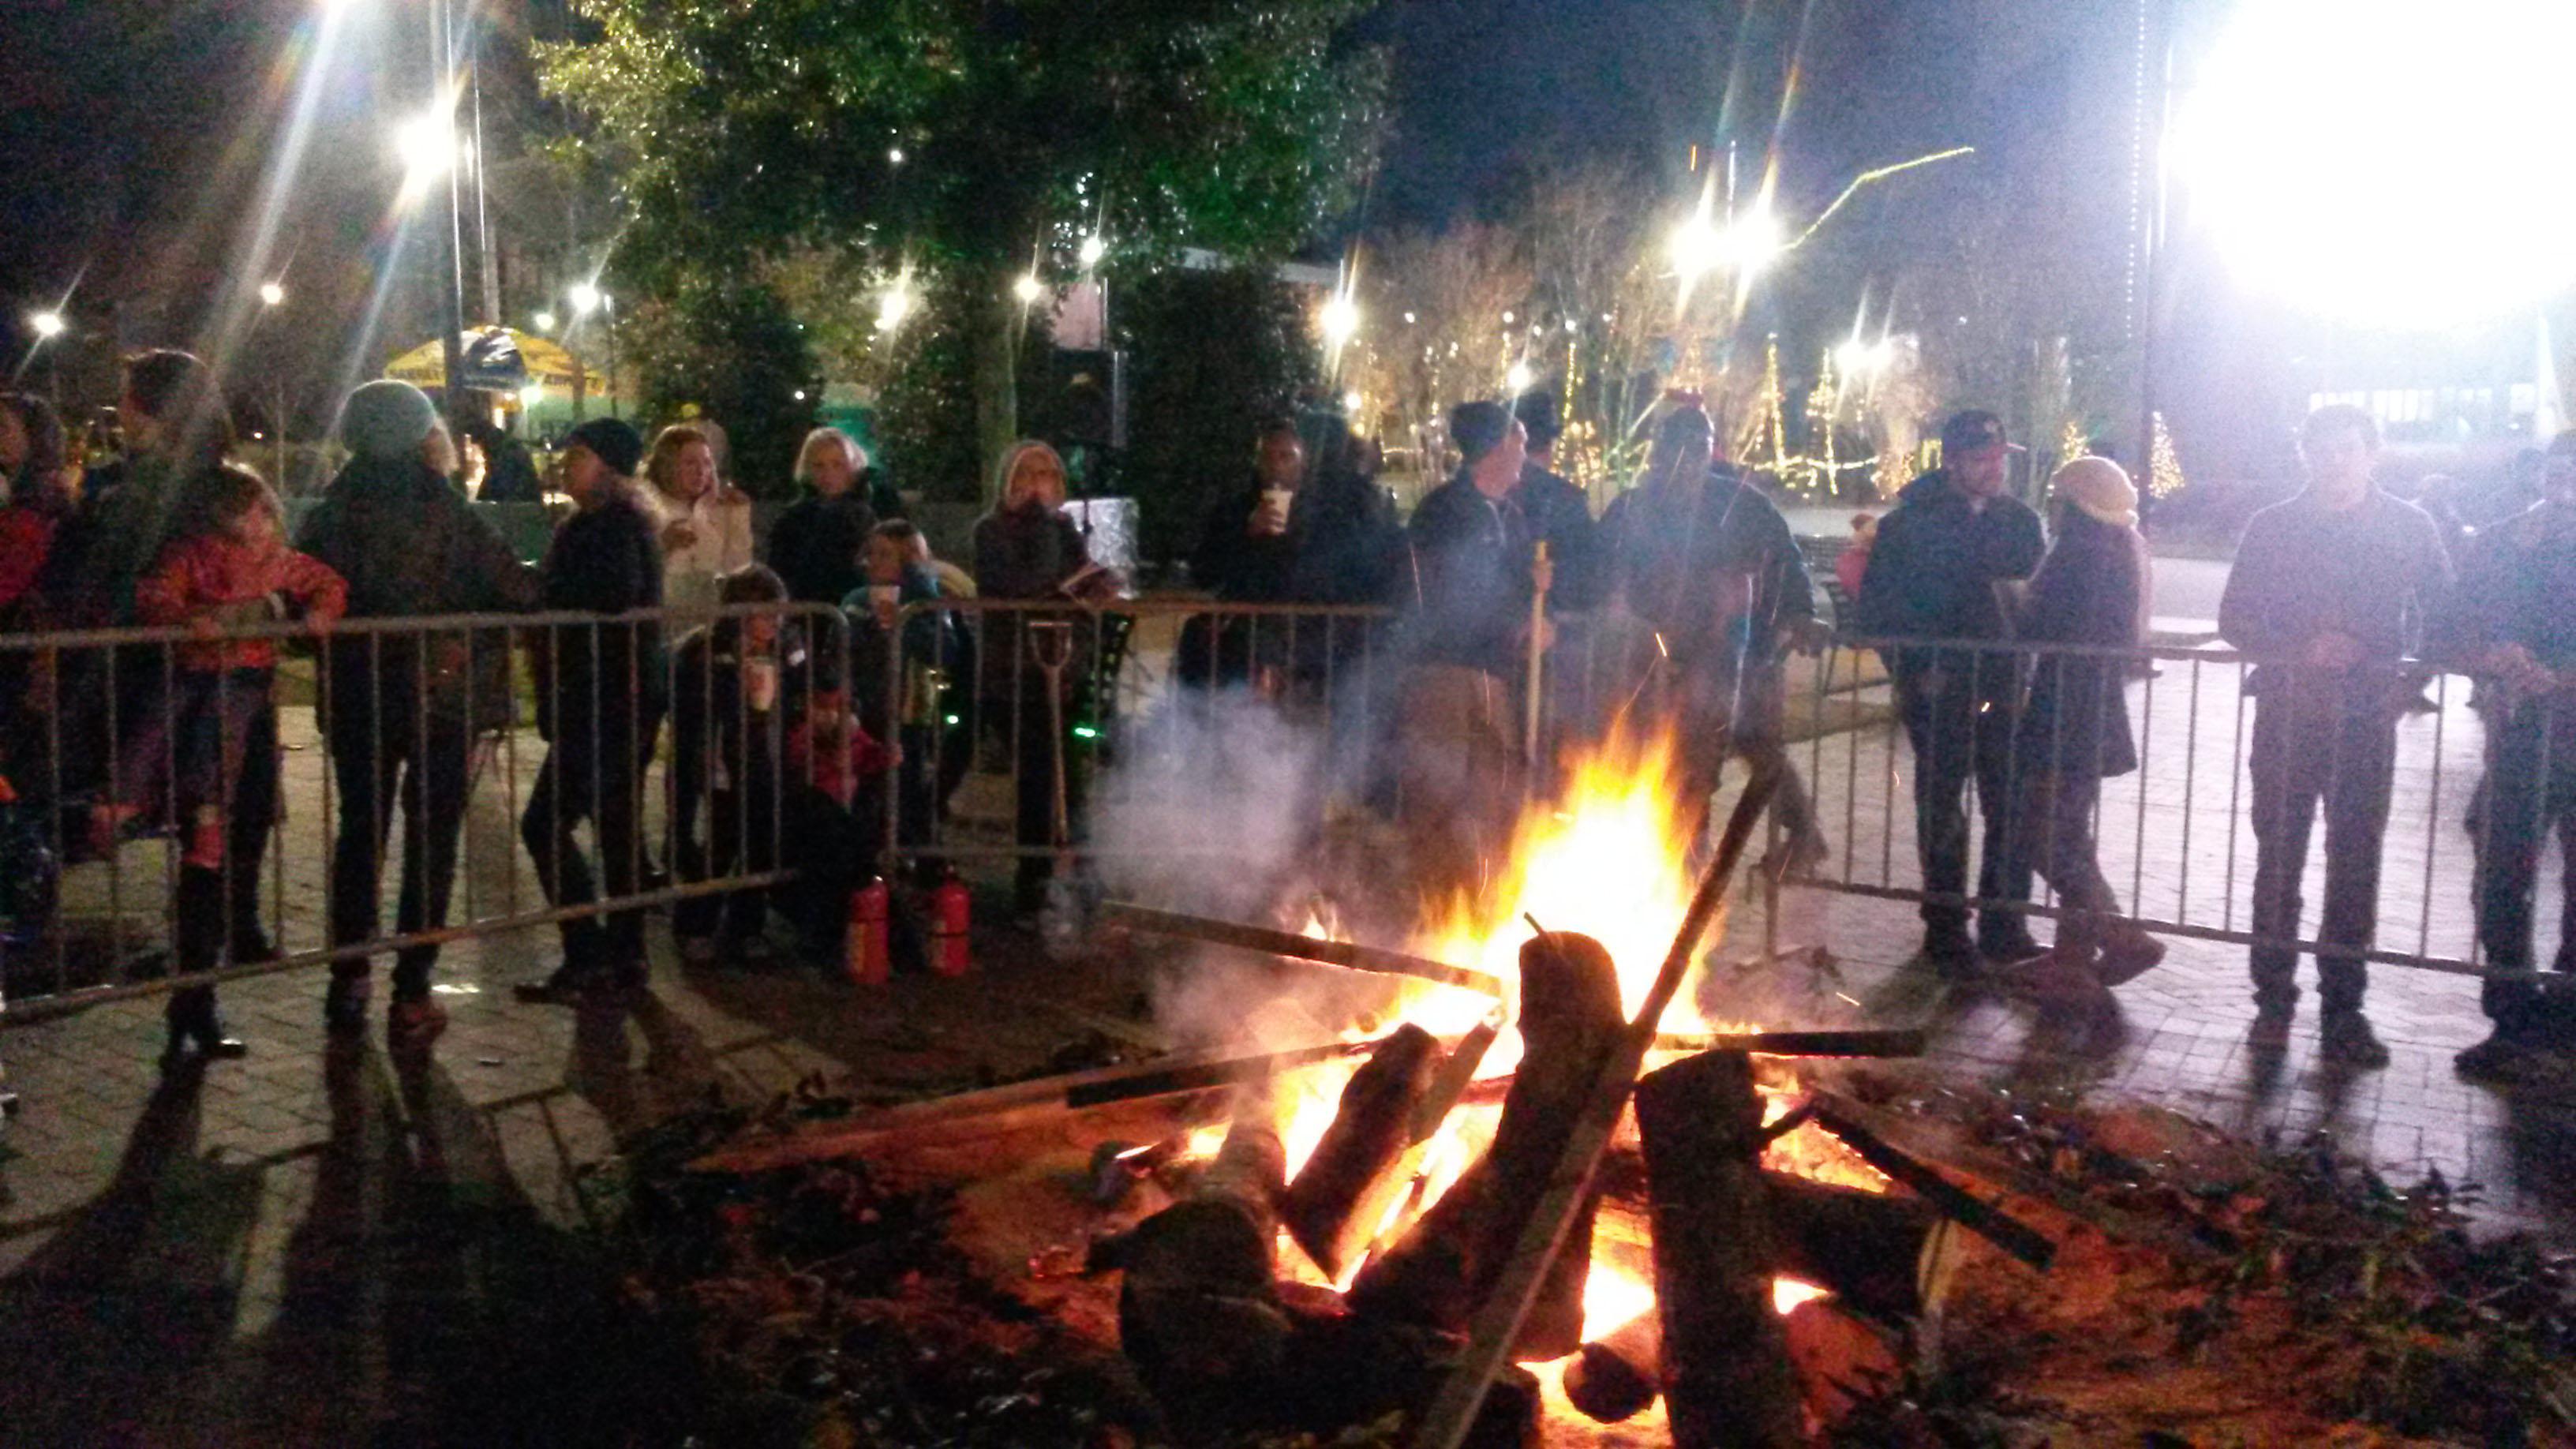 Burning yule log image